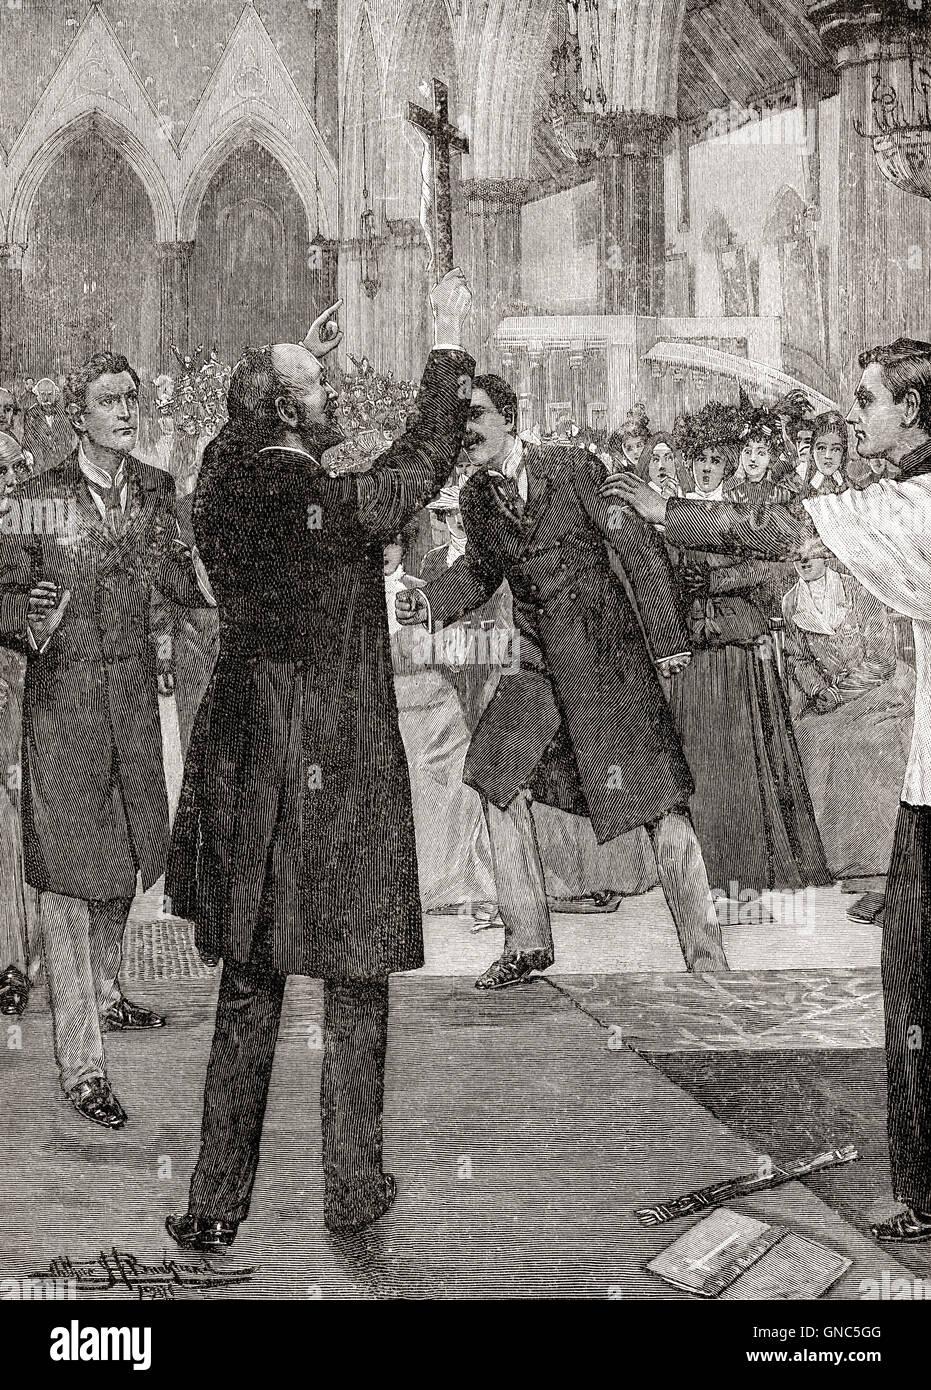 John Kensit protestando contra el ritualismo en 1898. John Kensit, 1853 - 1902. Líder religioso inglés, Imagen De Stock